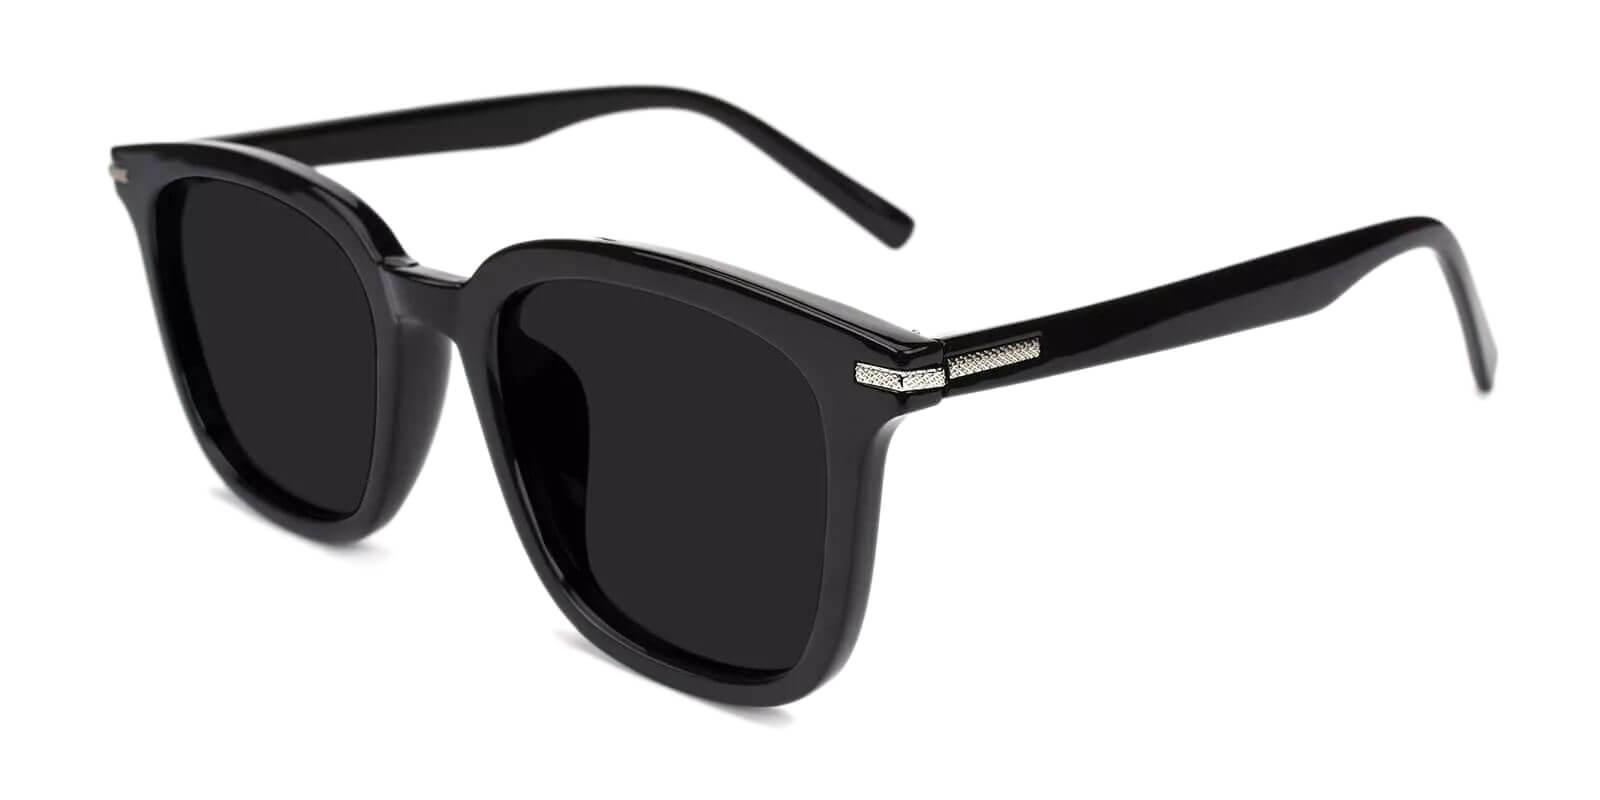 Willow Black Acetate UniversalBridgeFit , Fashion , Sunglasses Frames from ABBE Glasses